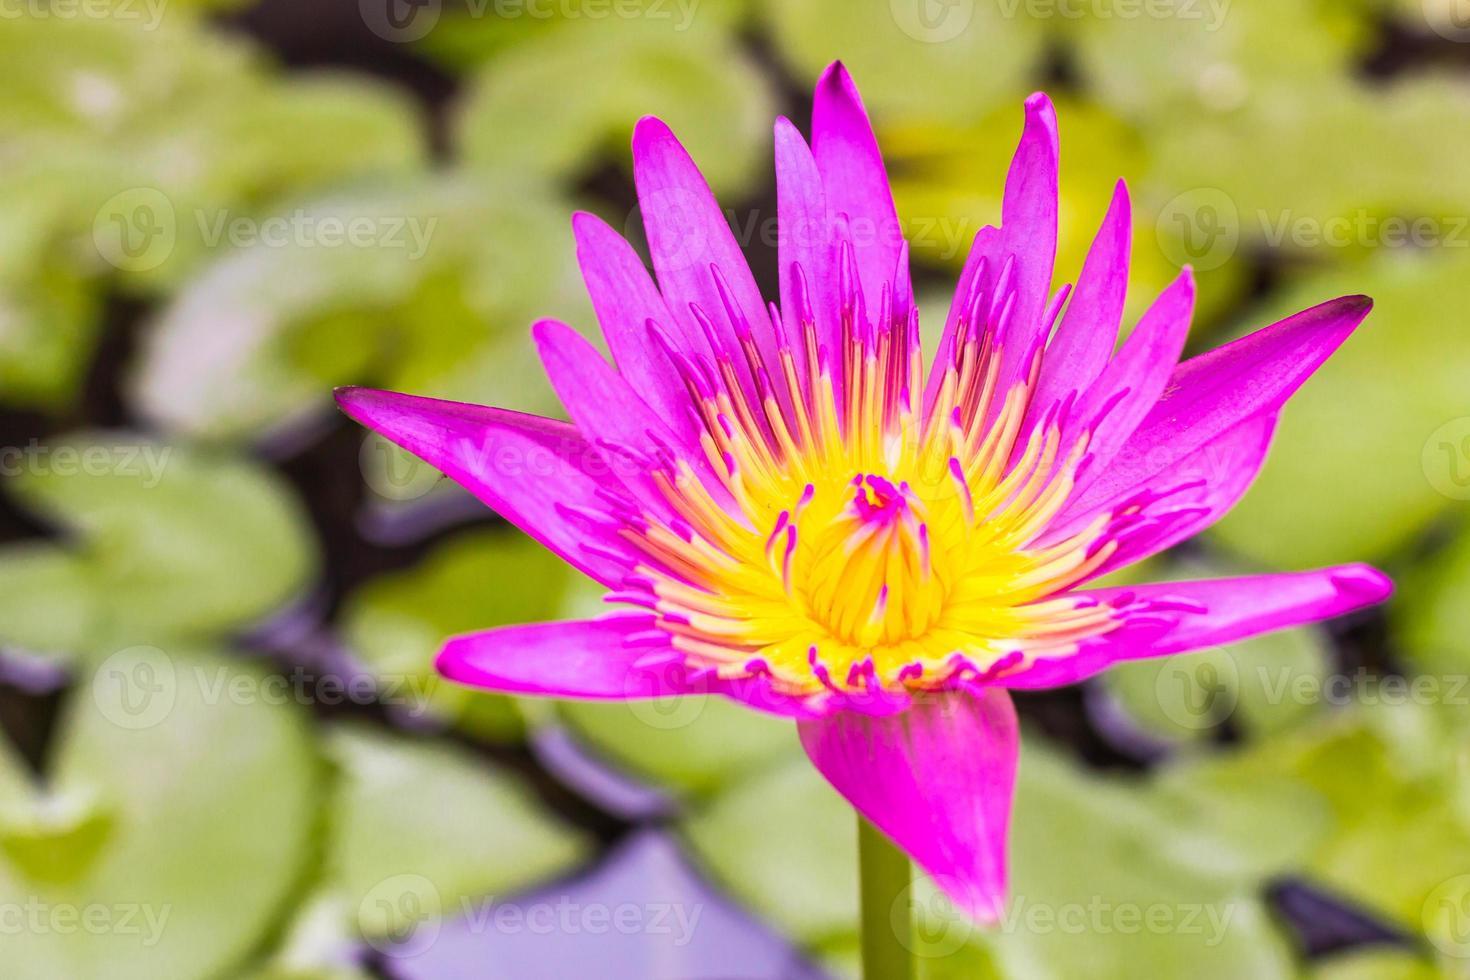 lótus rosa está florescendo na lagoa foto